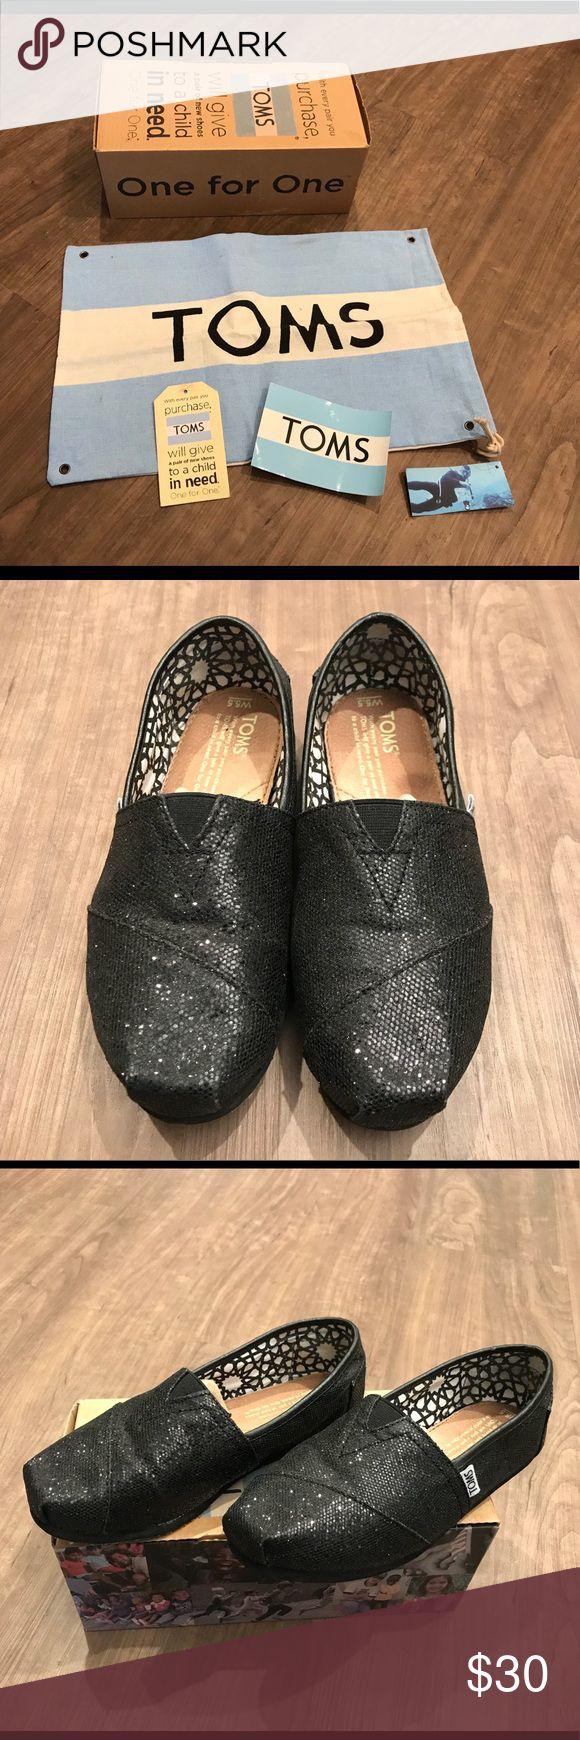 Tom's classic black glitter Tom's classic black glitter Toms Shoes Flats & Loafers